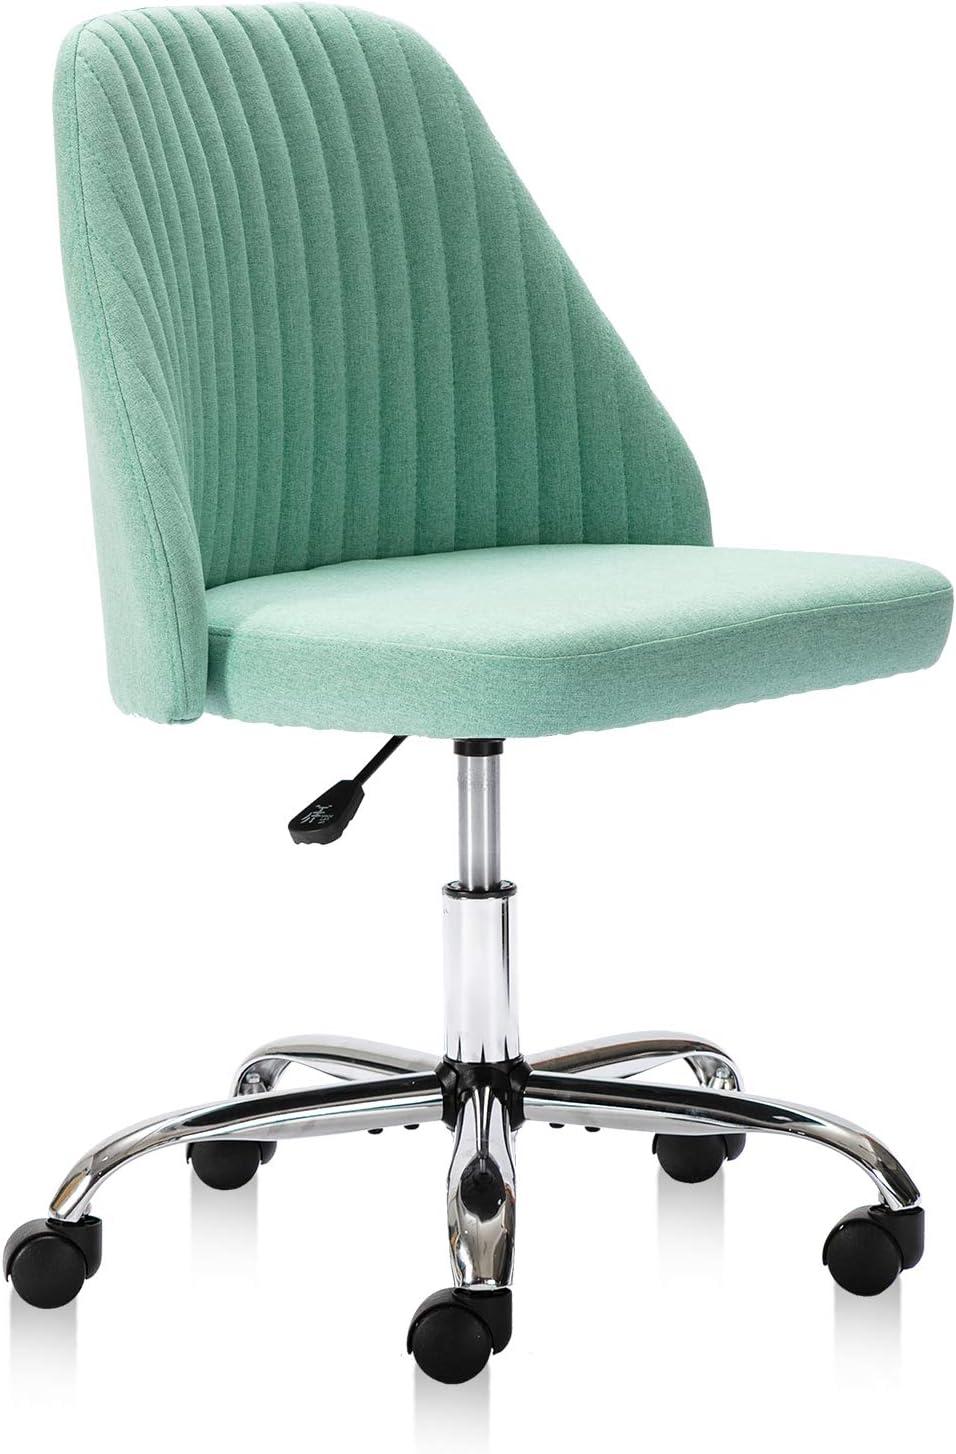 Home Office Chair, Modern Twill Fabric Chair Adjustable Desk Chair Mid-Back Task Chair Ergonomic Executive Chair-Green